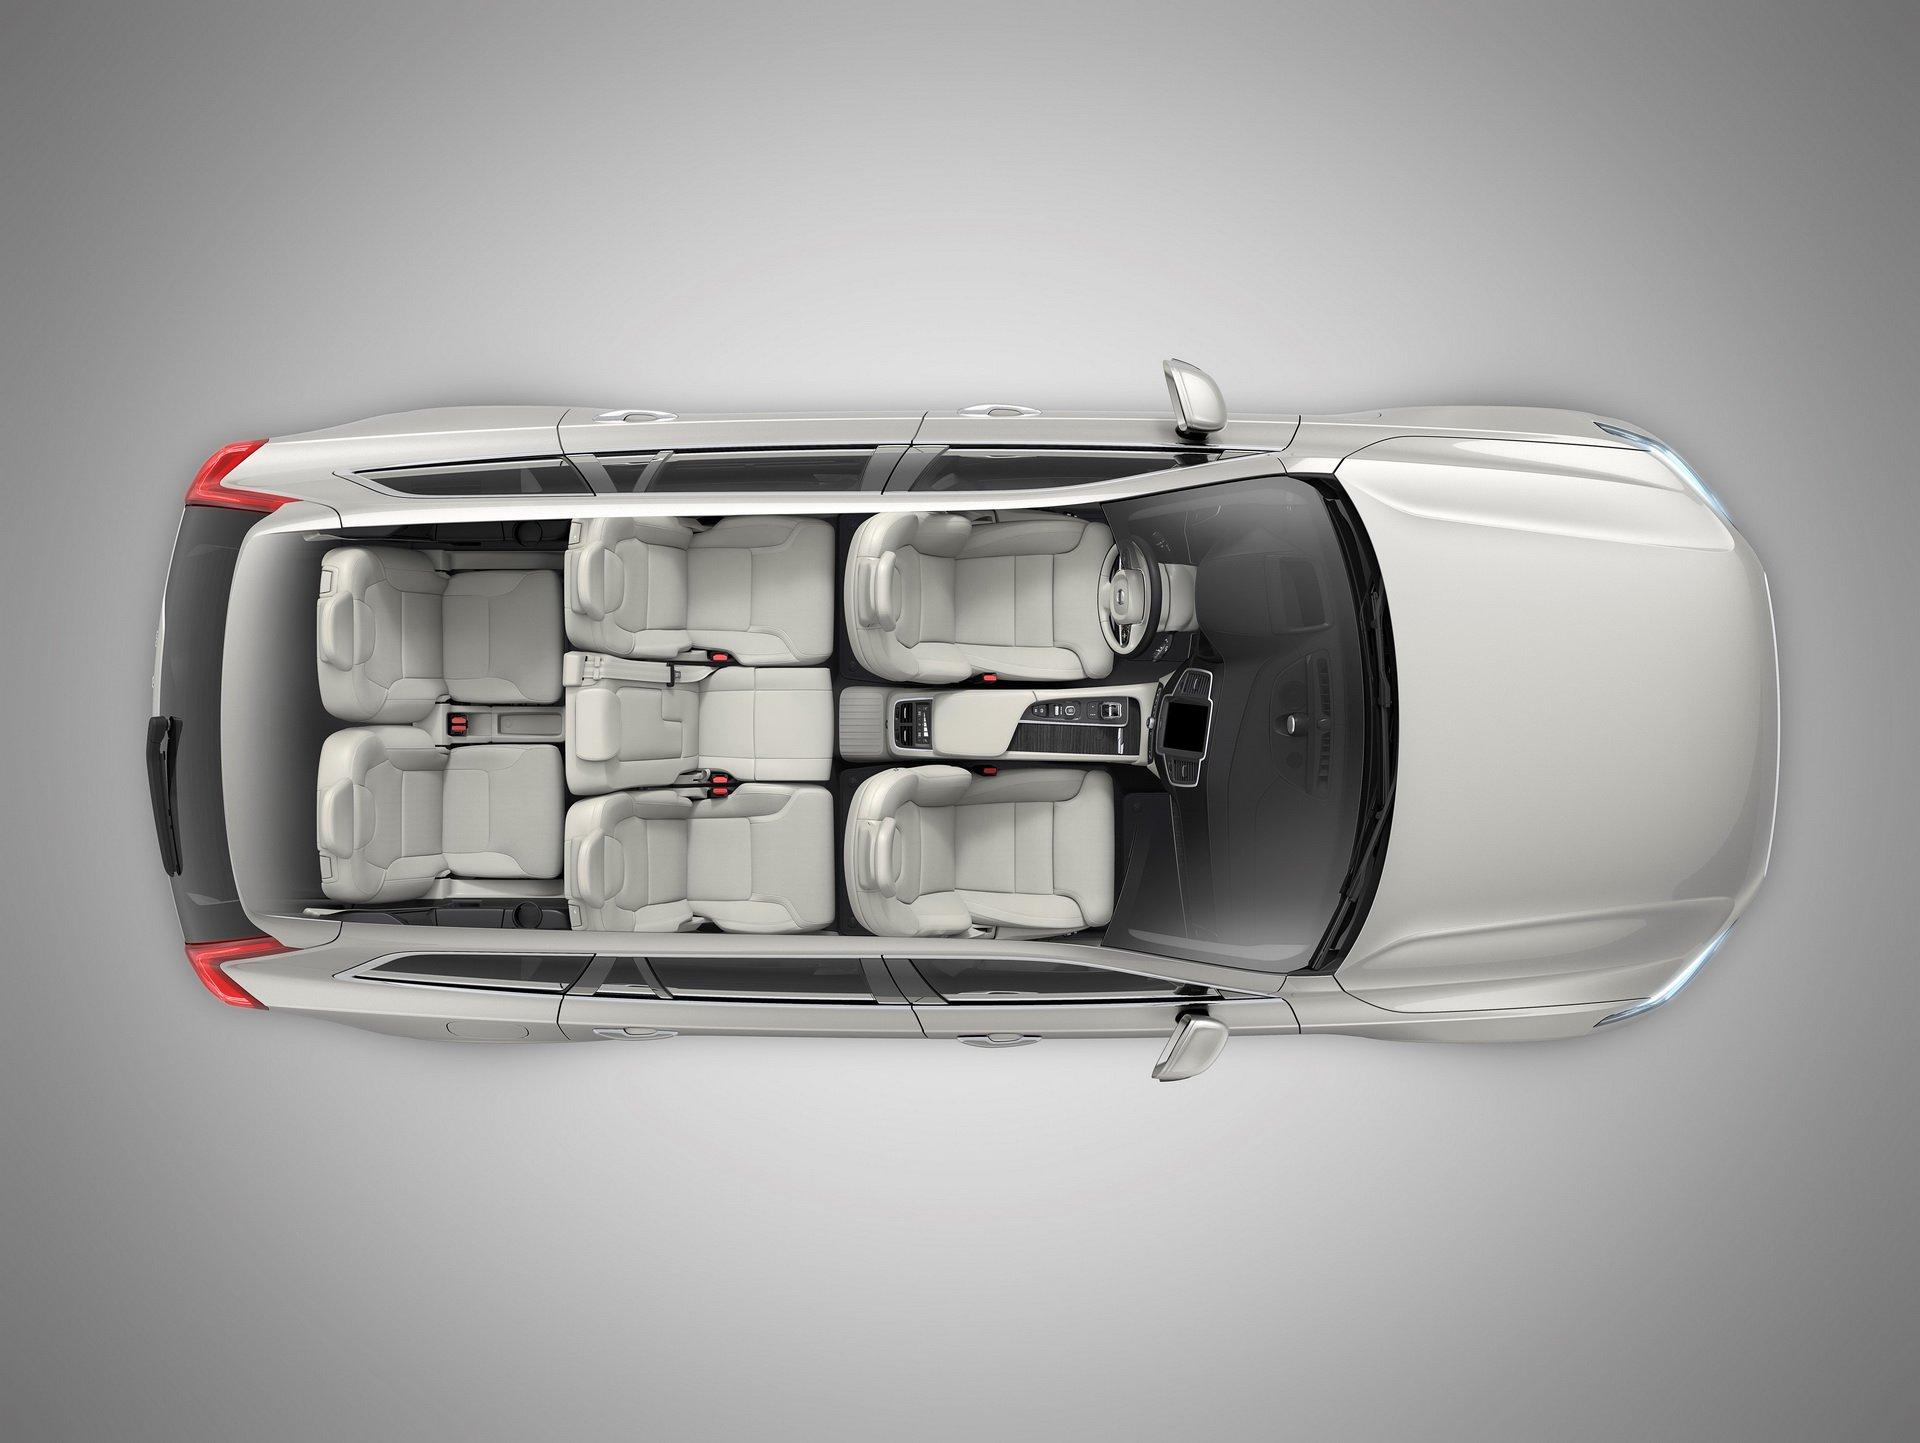 2020 Volvo XC90 Redesign, Hybrid, T8, Interior >> 2020 Volvo Xc90 Inscription T8 Plug In Hybrid Color Birch